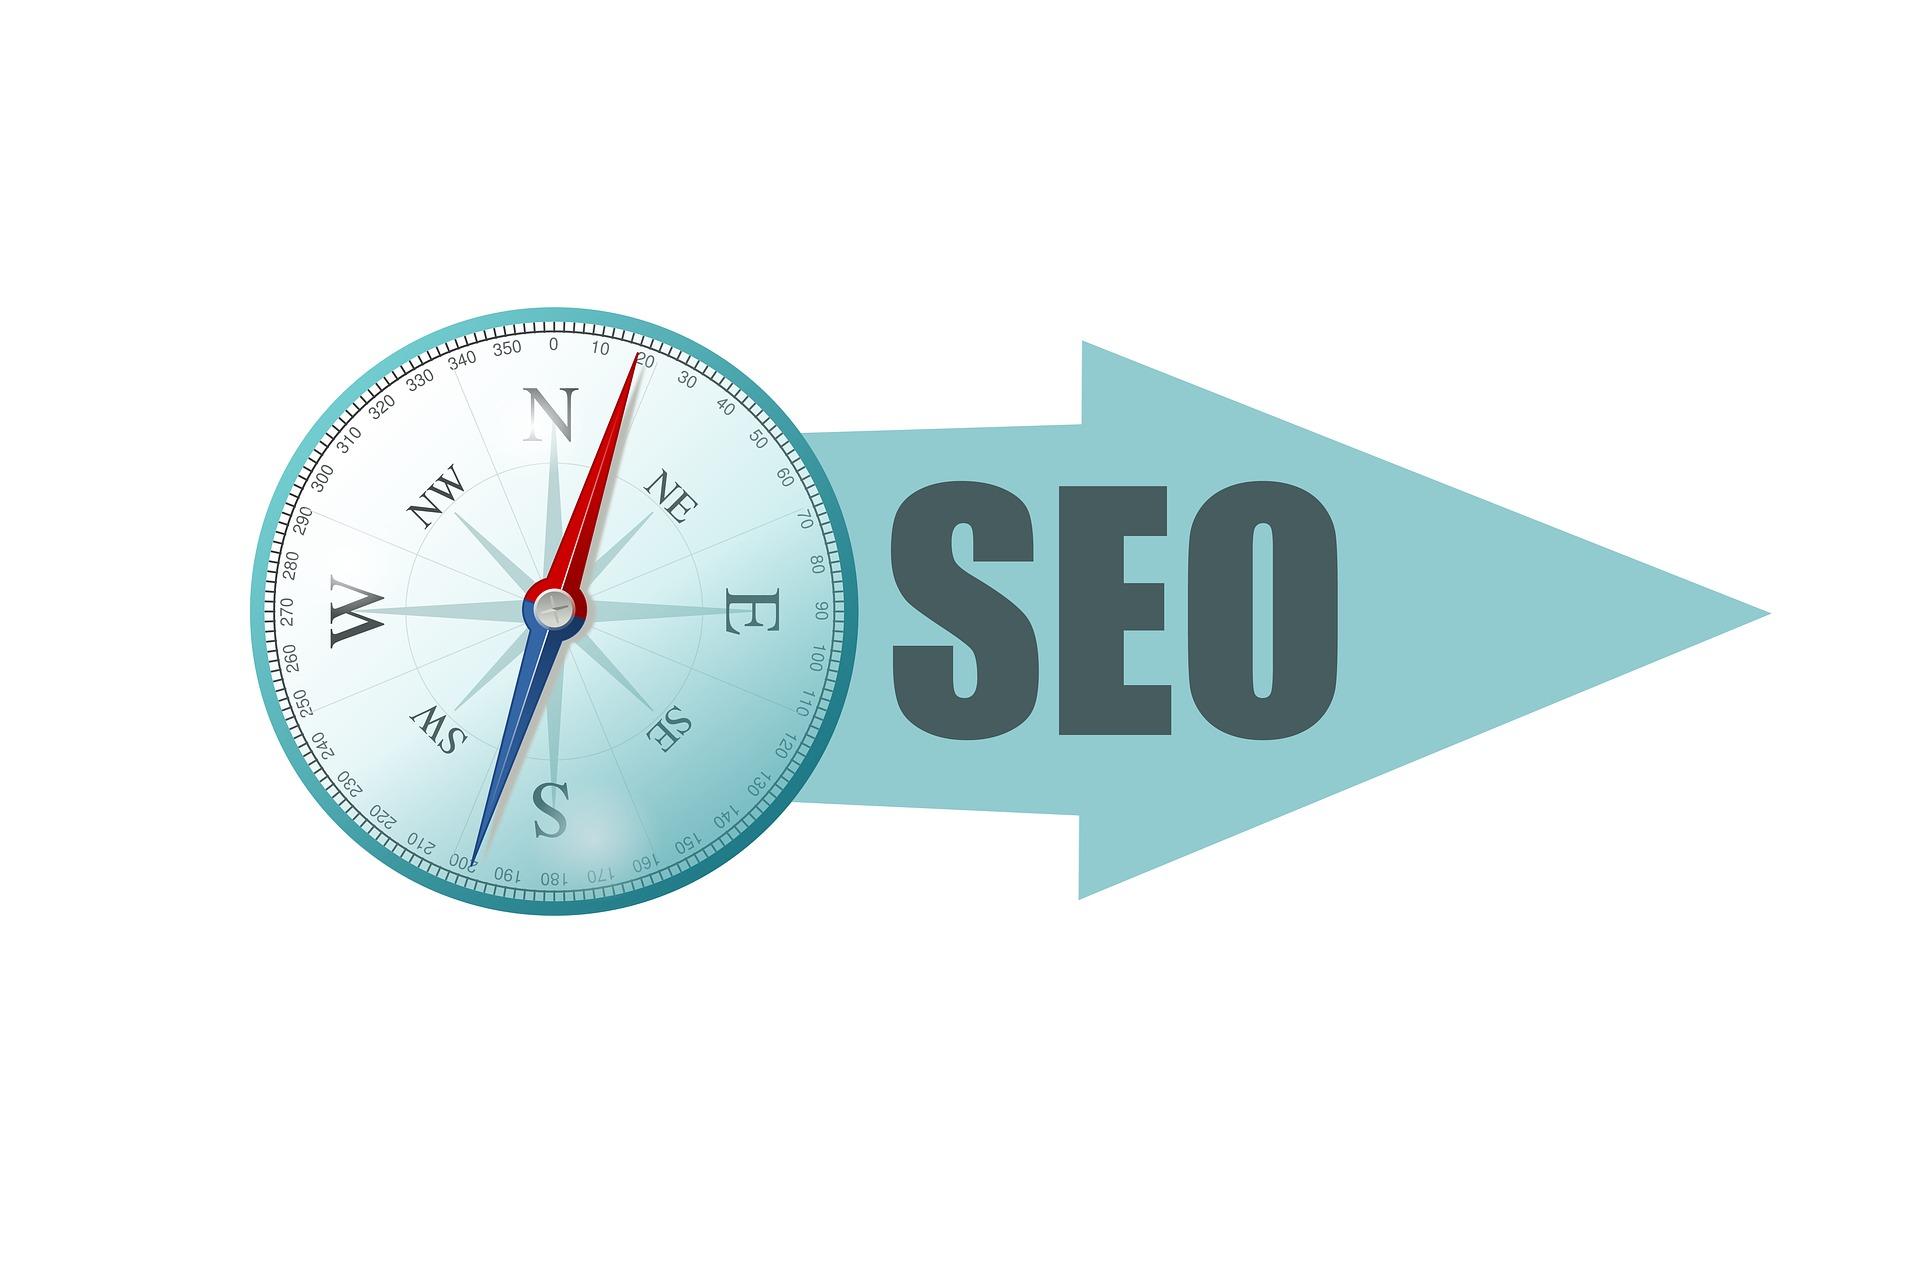 search-engine-optimization-1656918_1920.jpg